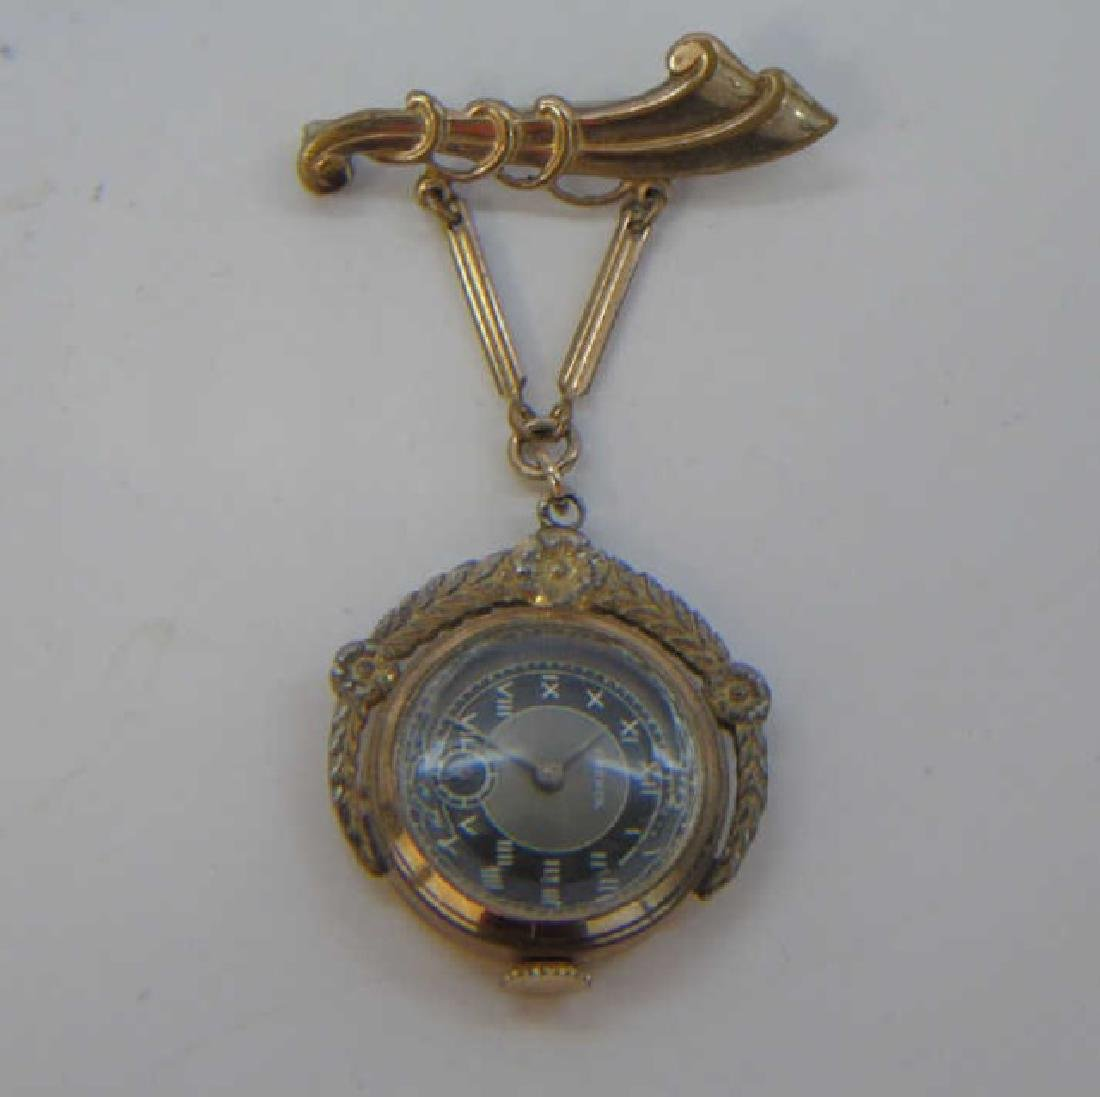 Antique Estate Gold Filled Frenca Brooch Watch